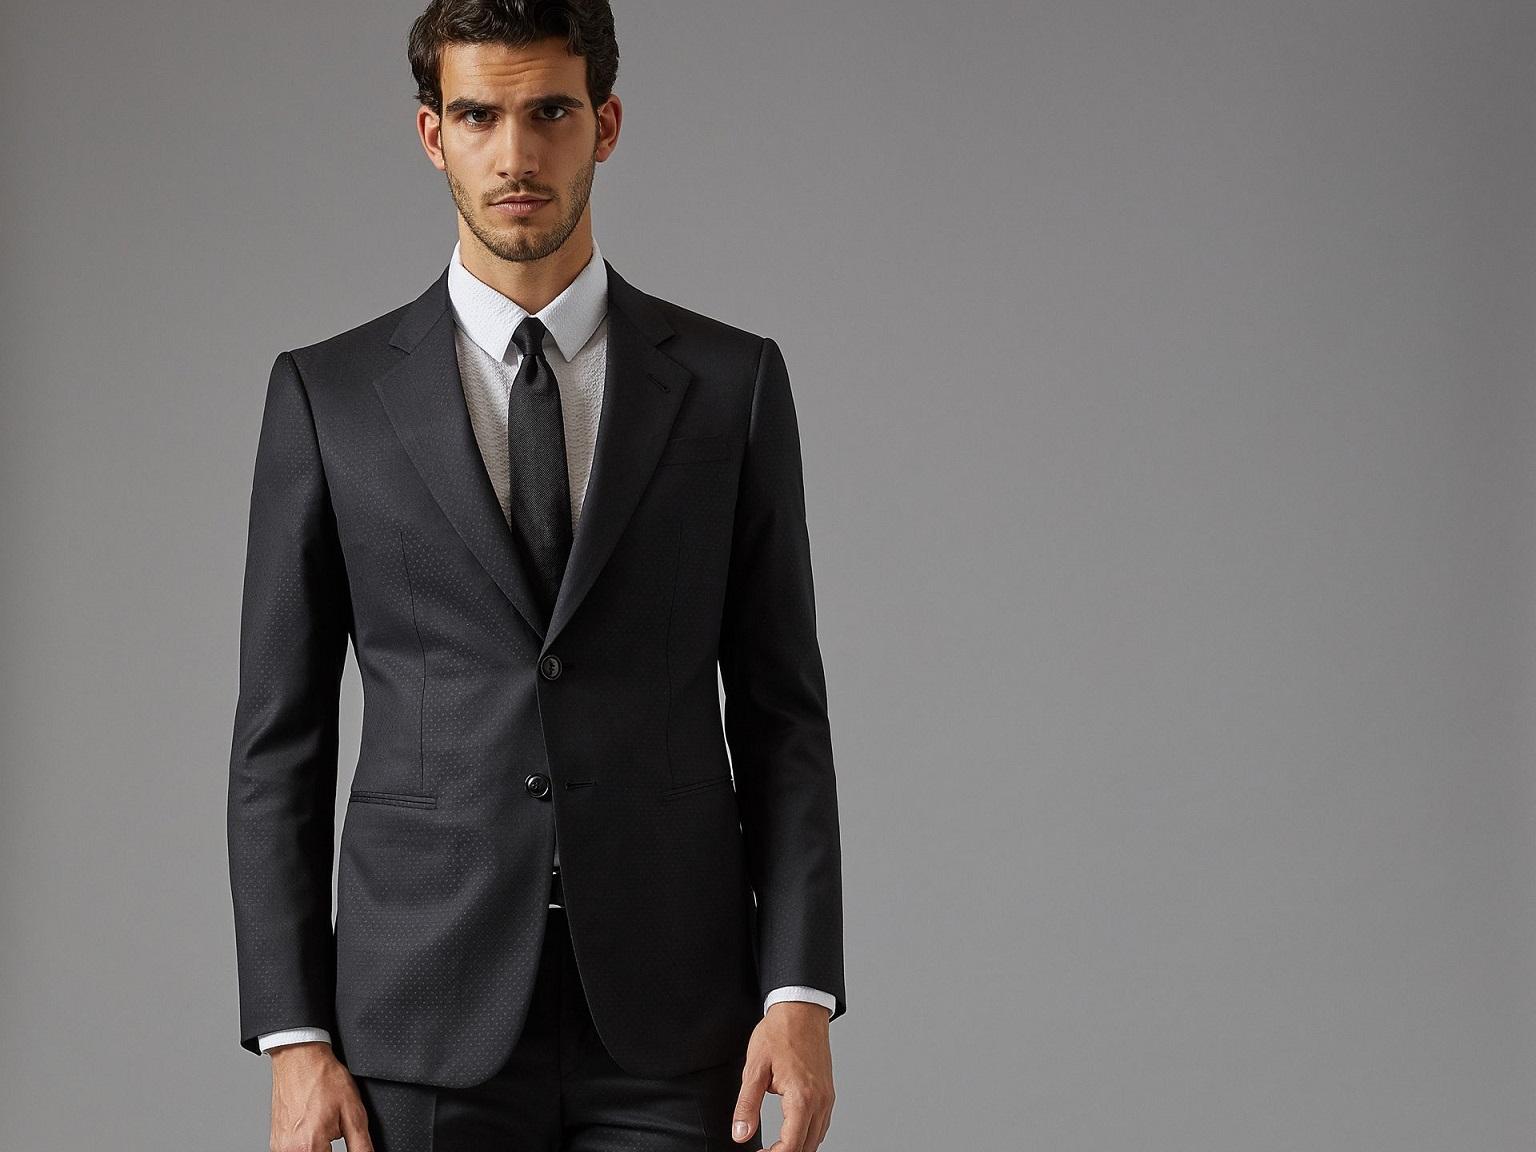 Men\'s Suits & Tuxedos | Giorgio Armani